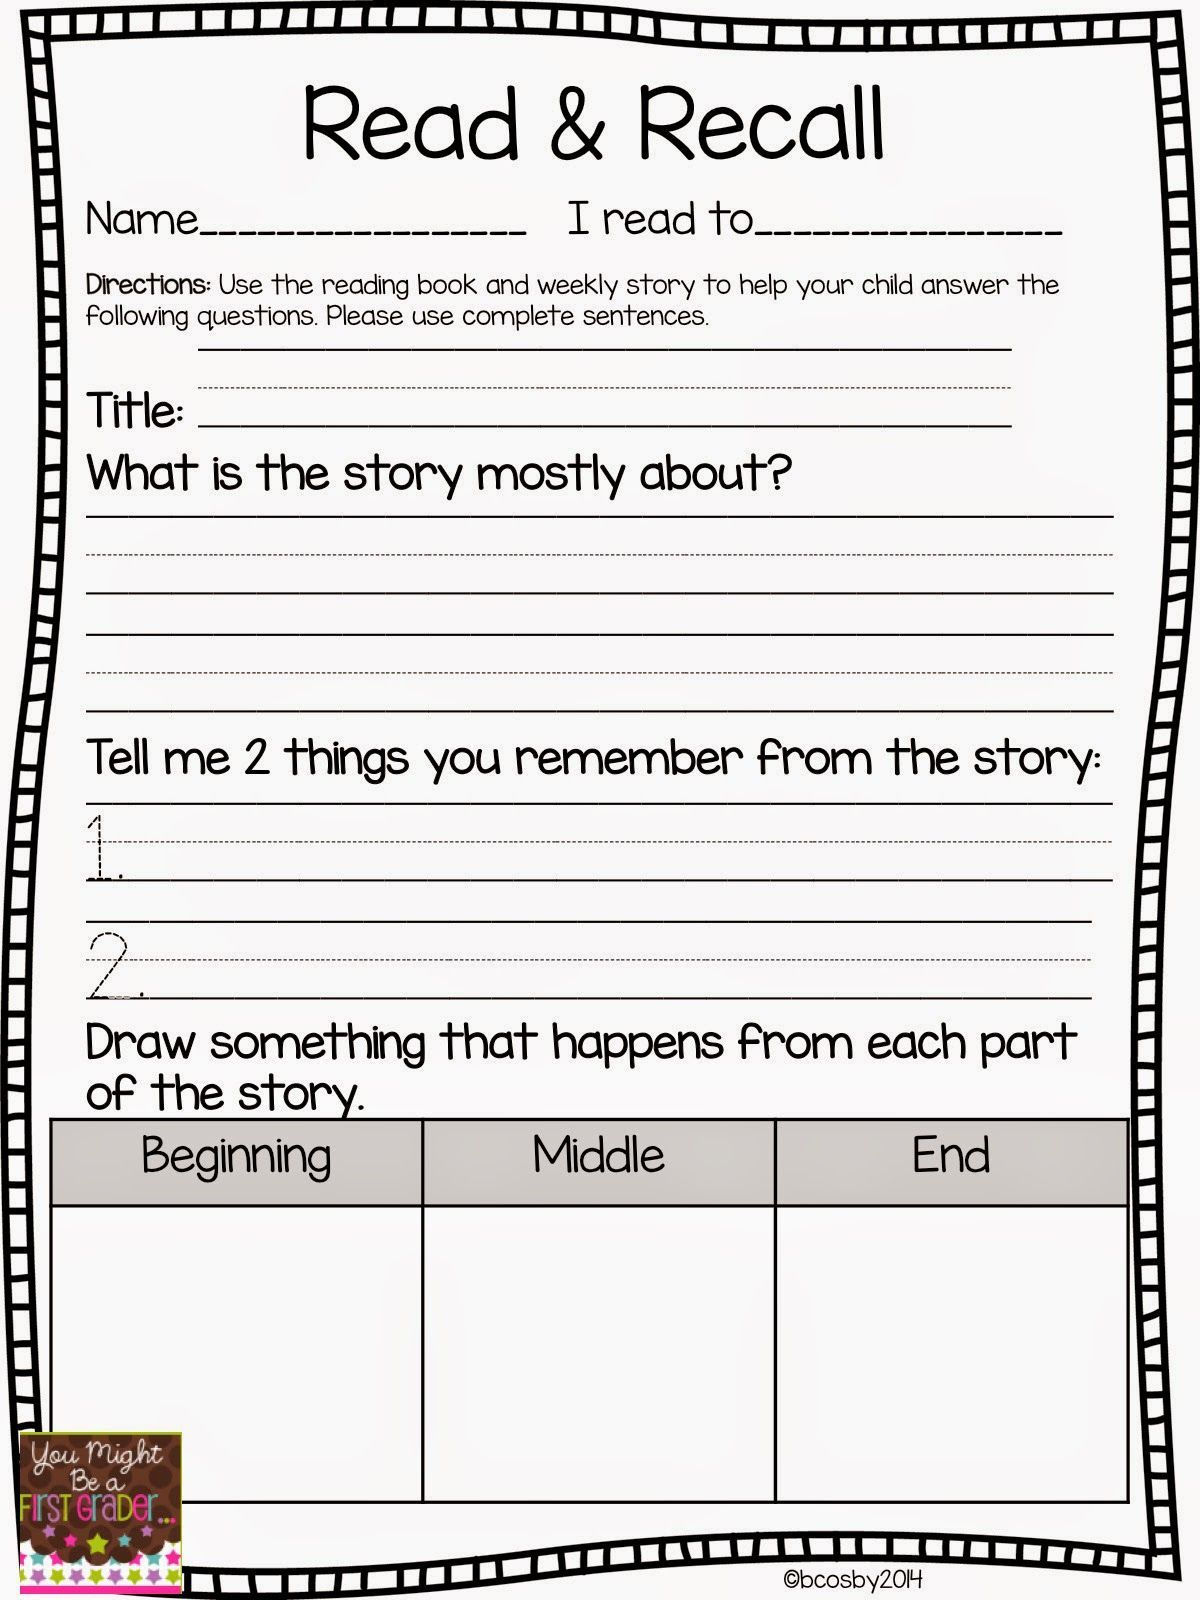 Reading Worksheets For 2nd Grade For Download Free Math Worksheet For Kids First Grade Reading 2nd Grade Reading First Grade Reading Comprehension